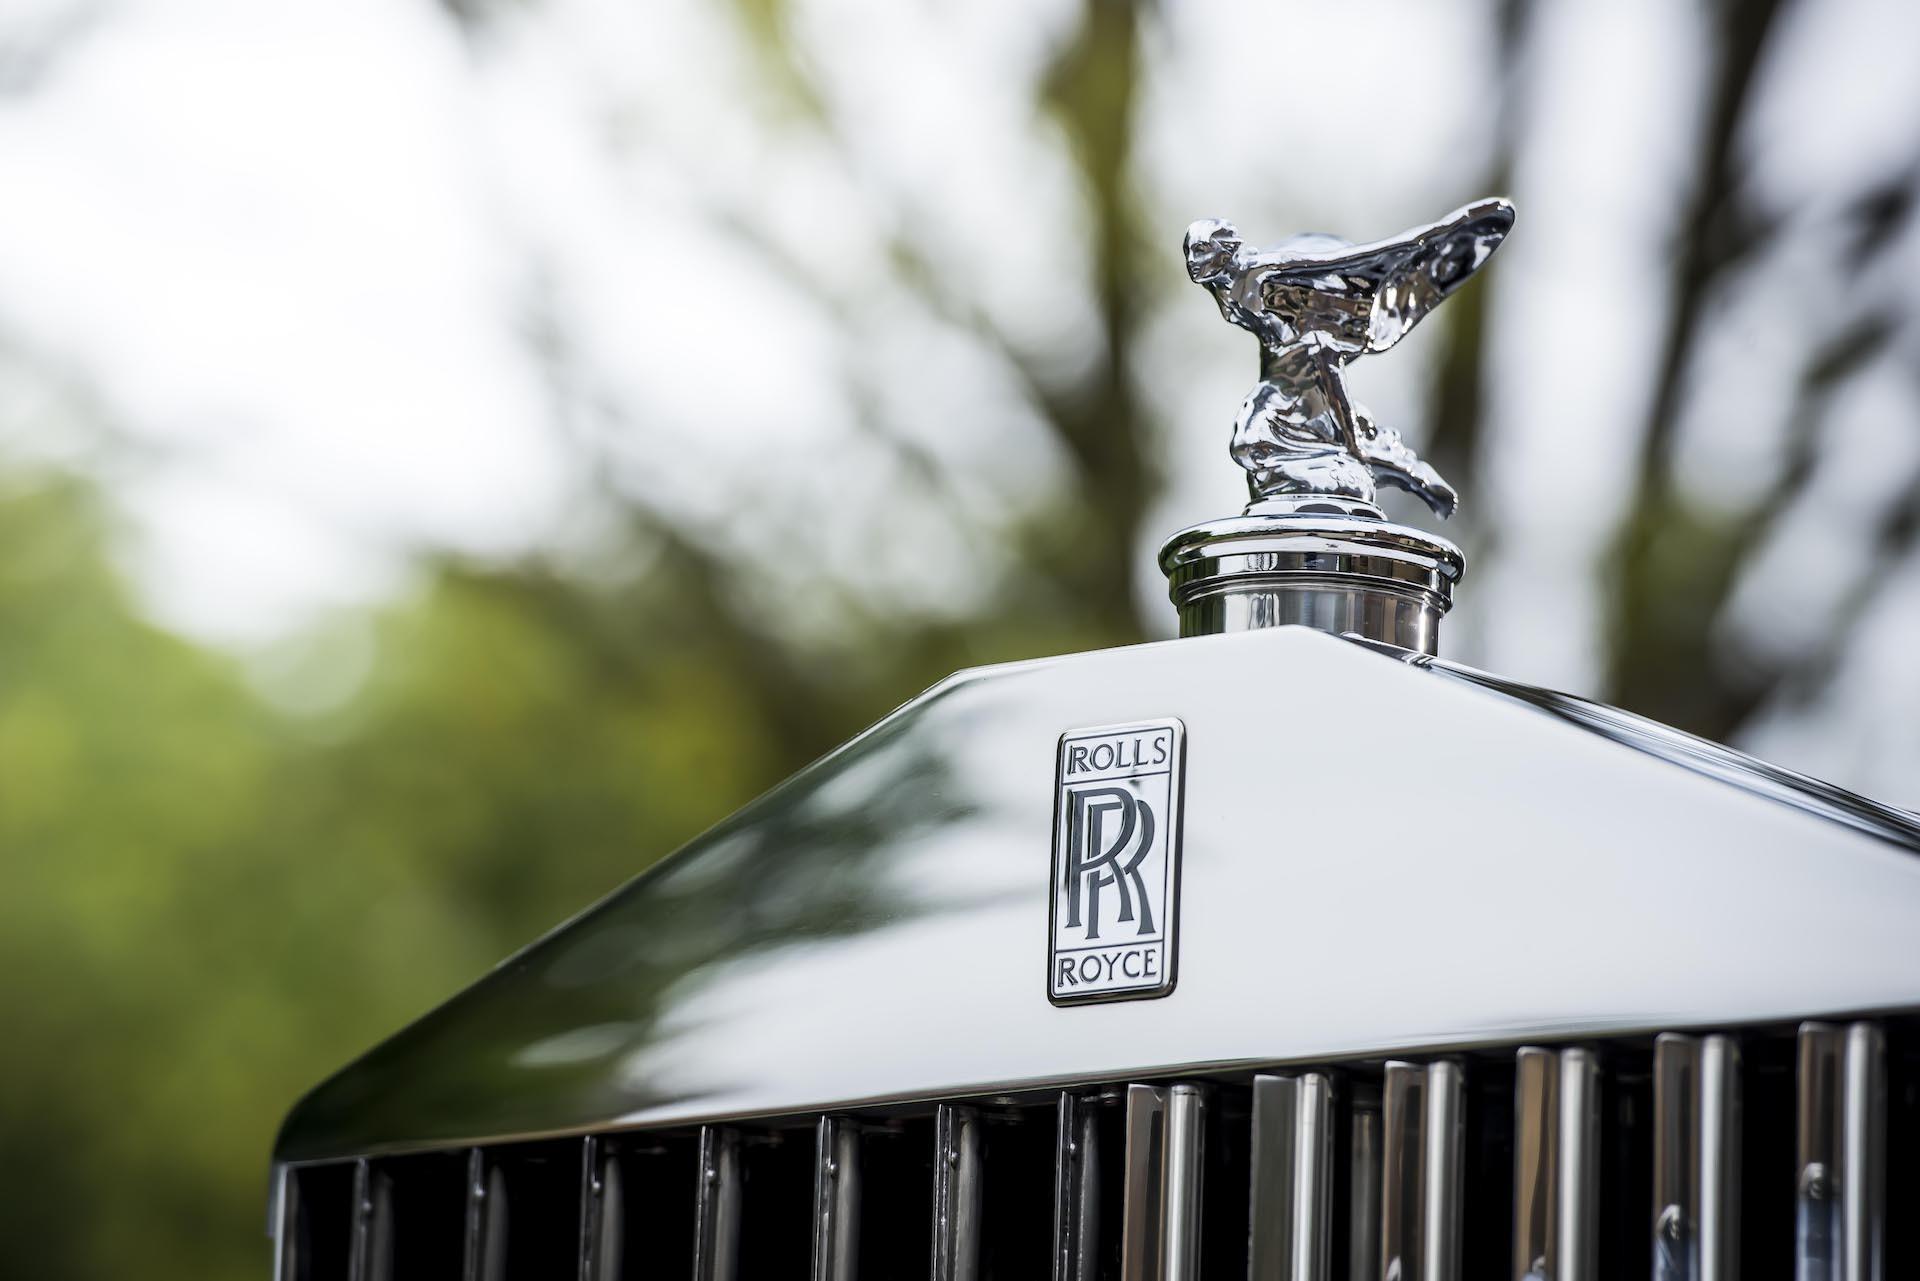 Montgomery Rolls Royce Phantom 2 Photo: James Lipman / Jameslipman.com